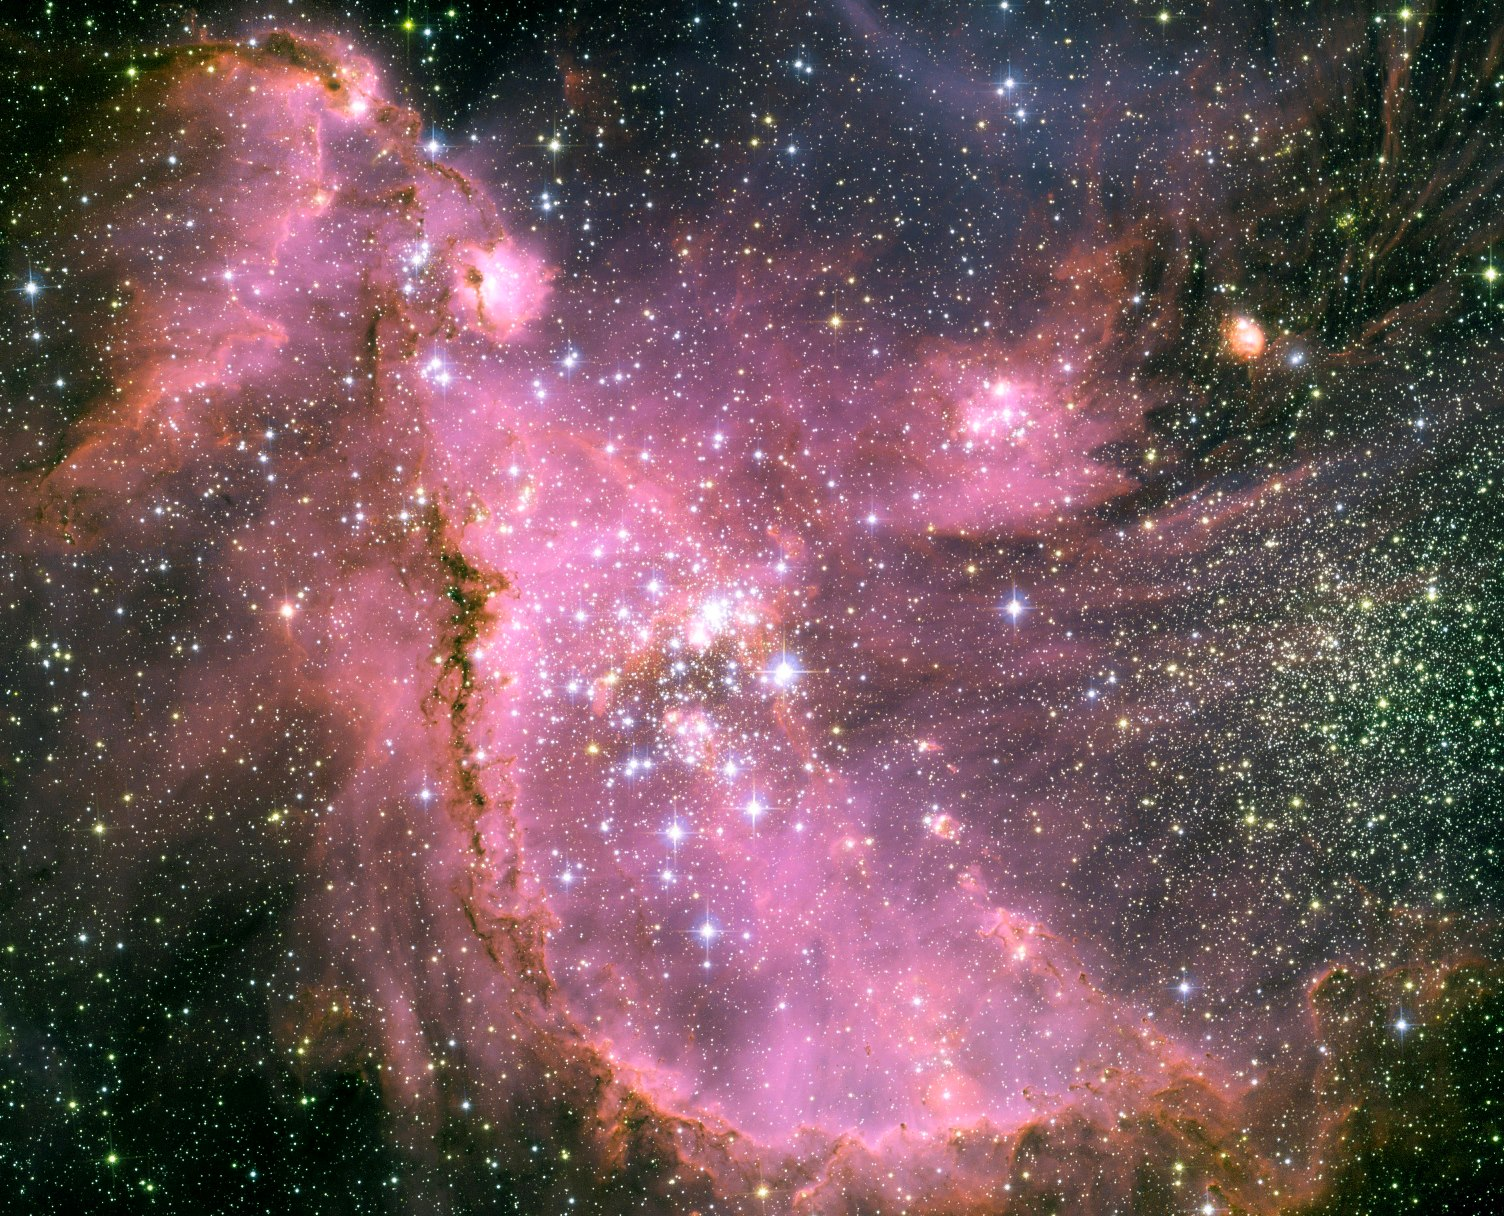 Novoformirane zvijezde. Izvor: Nasa.gov.